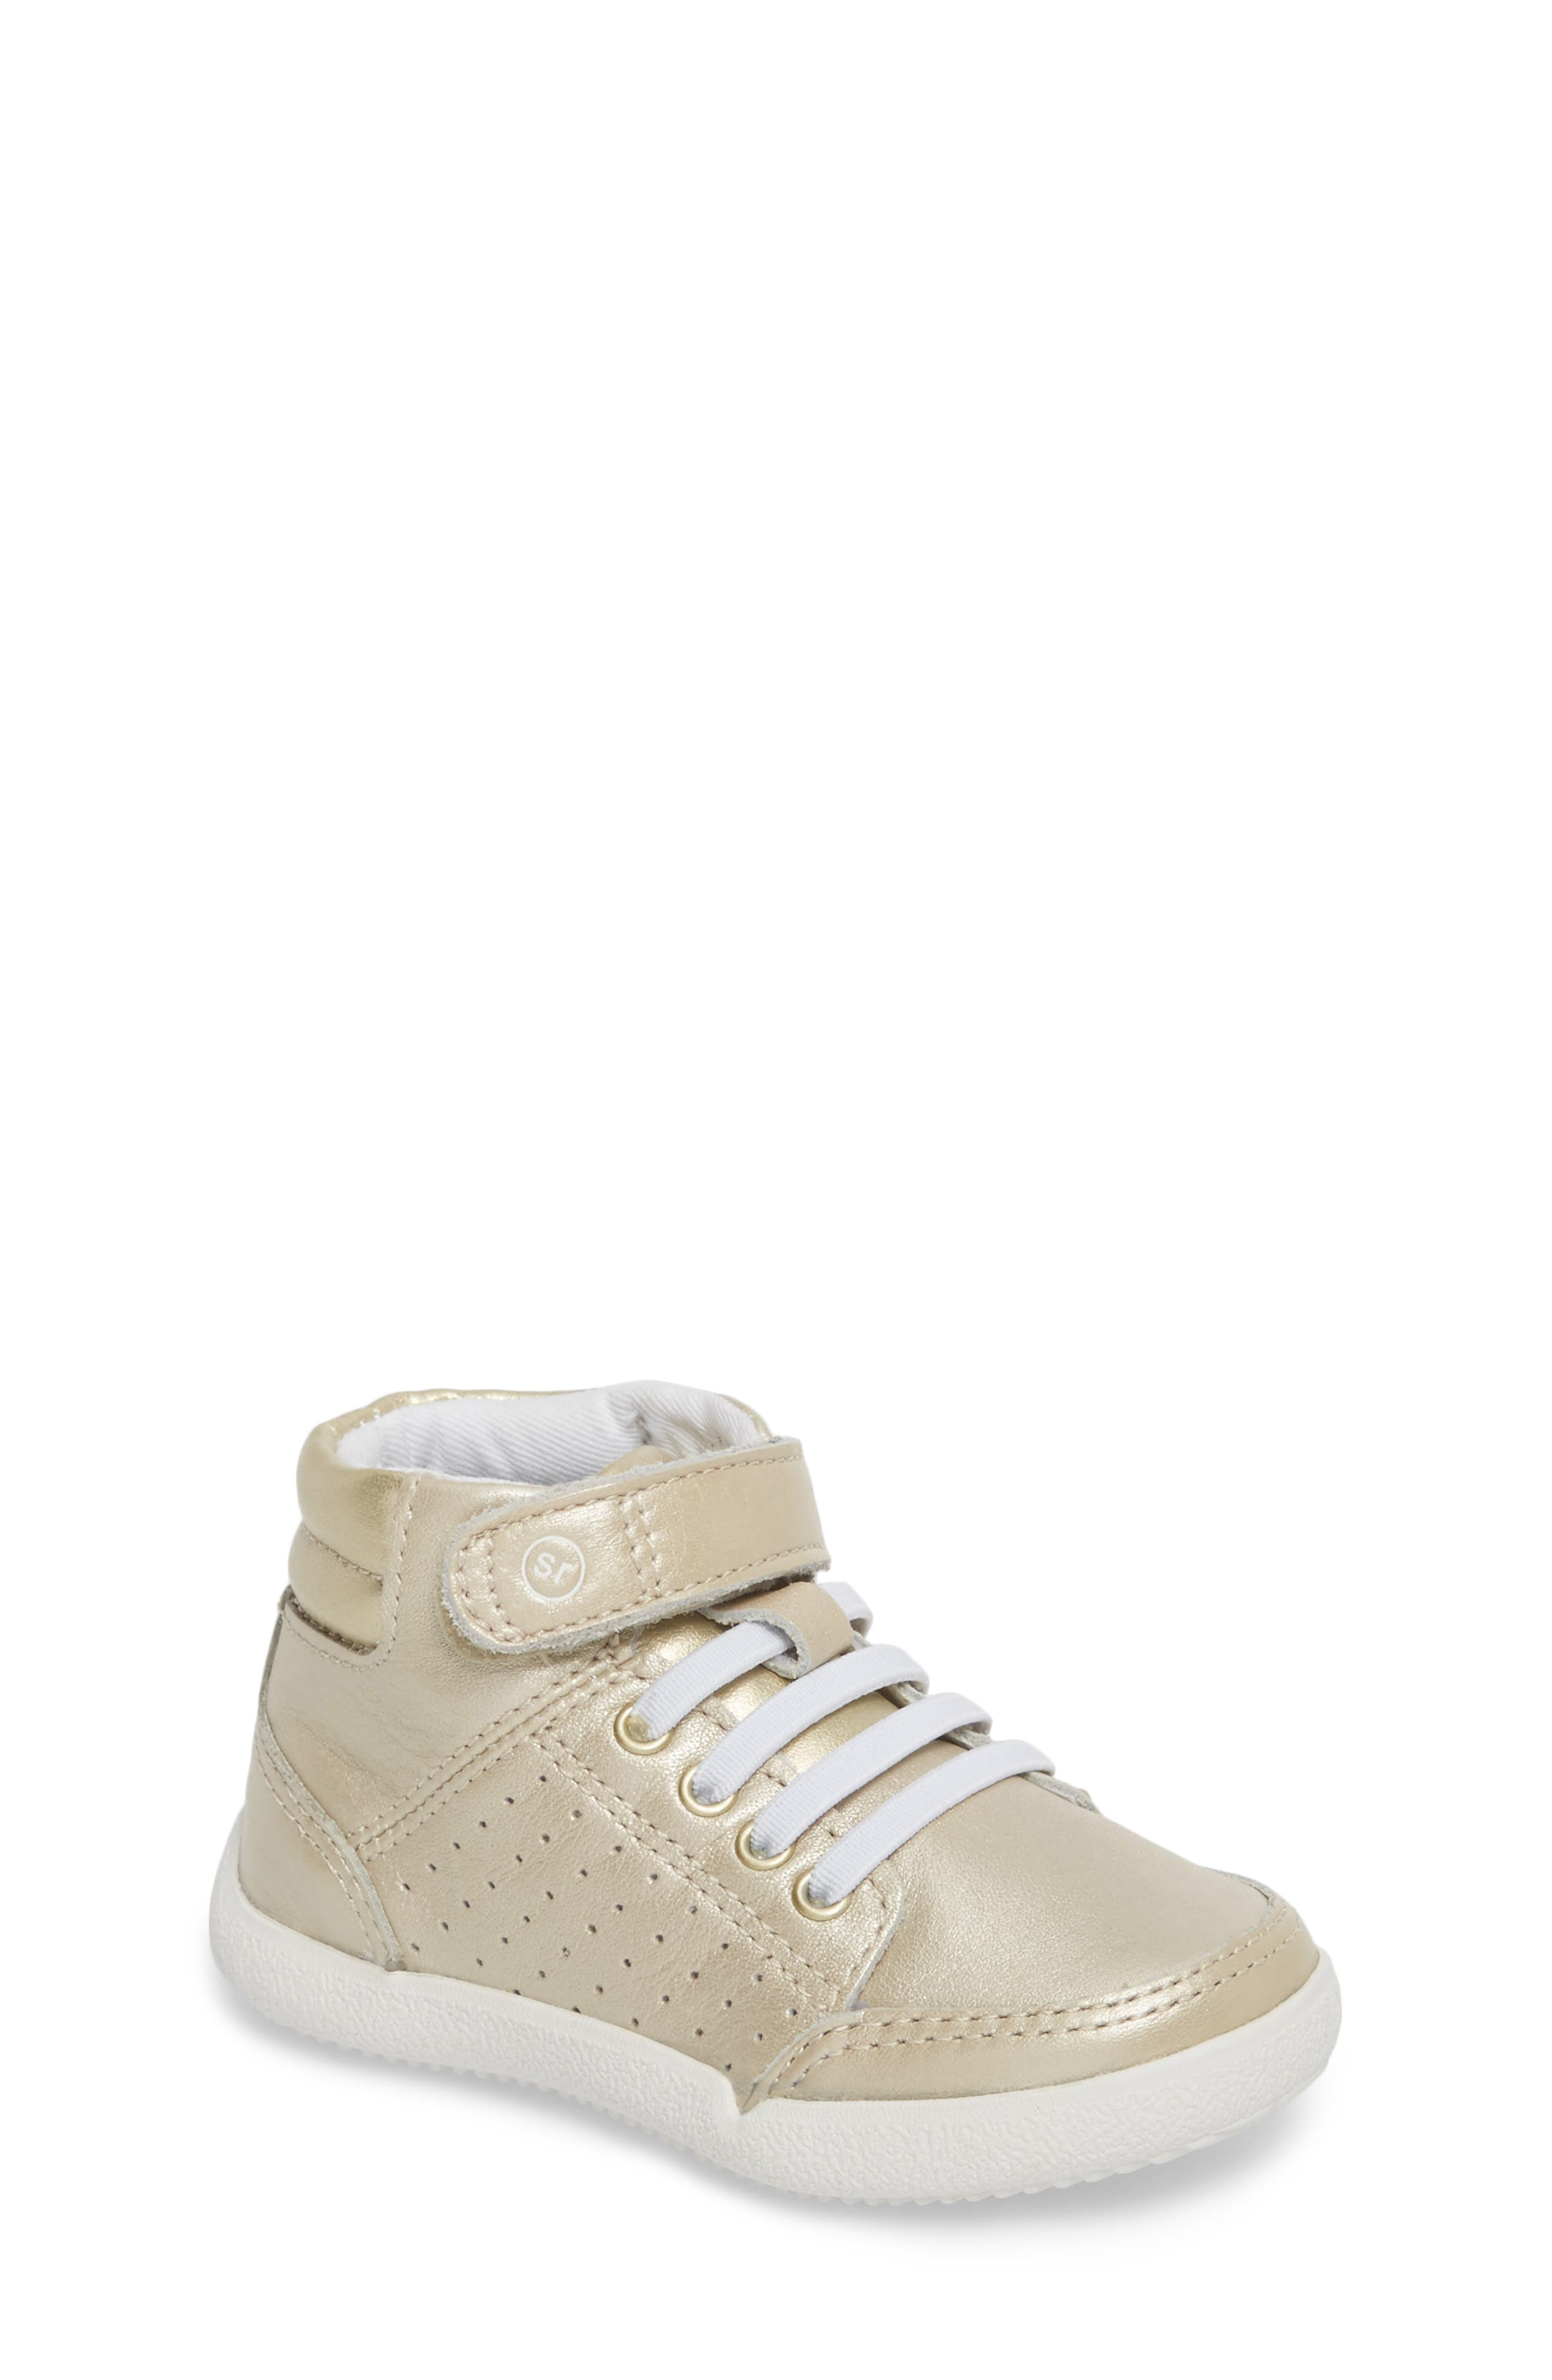 Main Image - Stride Rite Stone High Top Sneaker (Baby, Walker & Toddler)